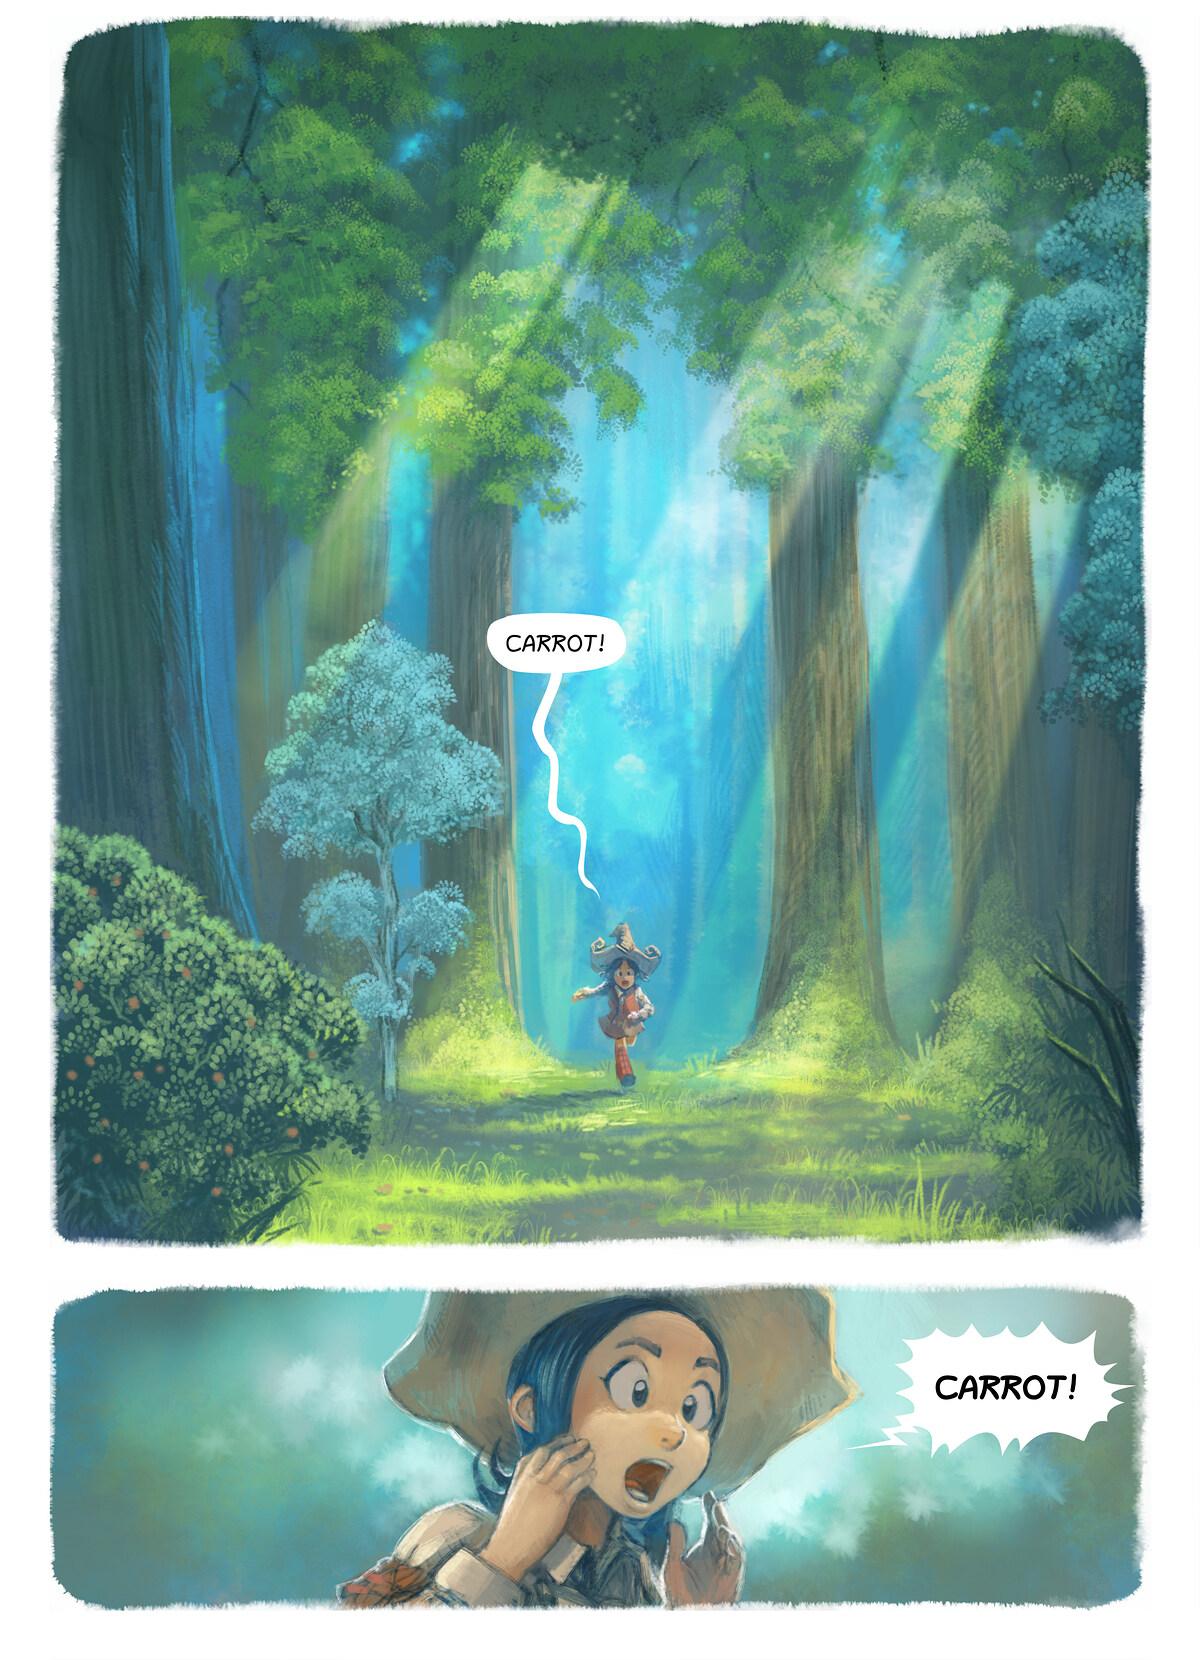 Aflevering 7: De wens, Page 1